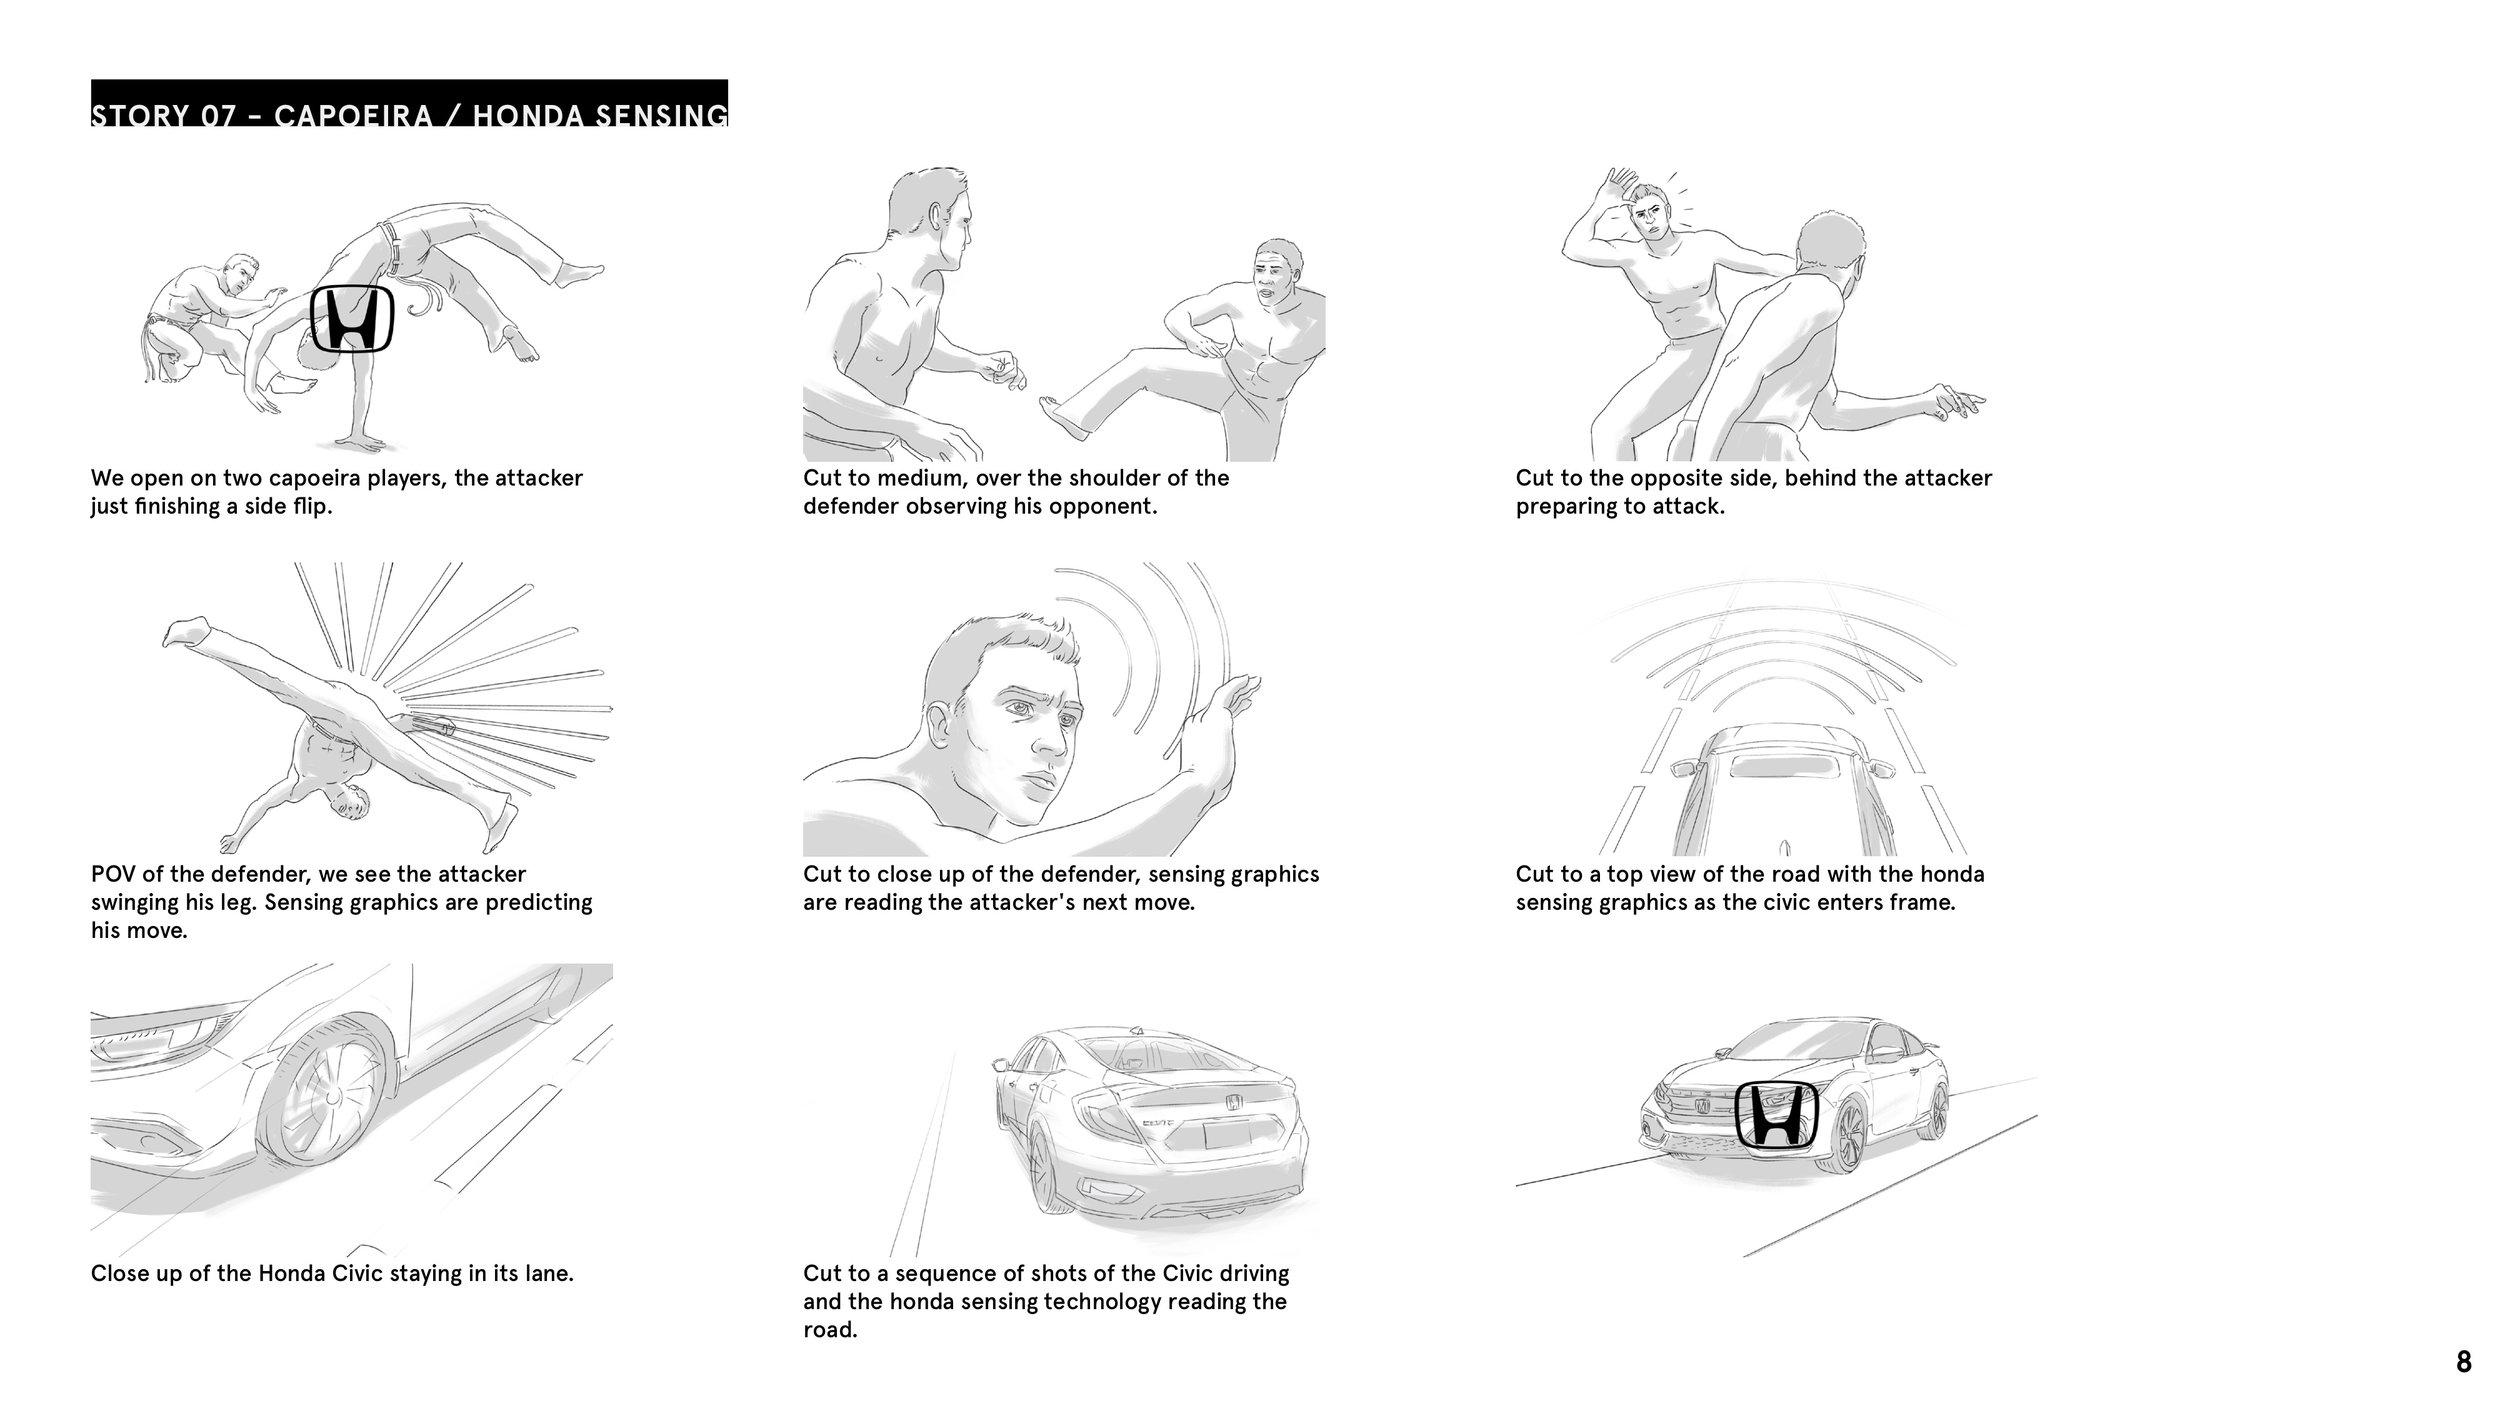 honda_inside_out_storyboards_007-3.jpg